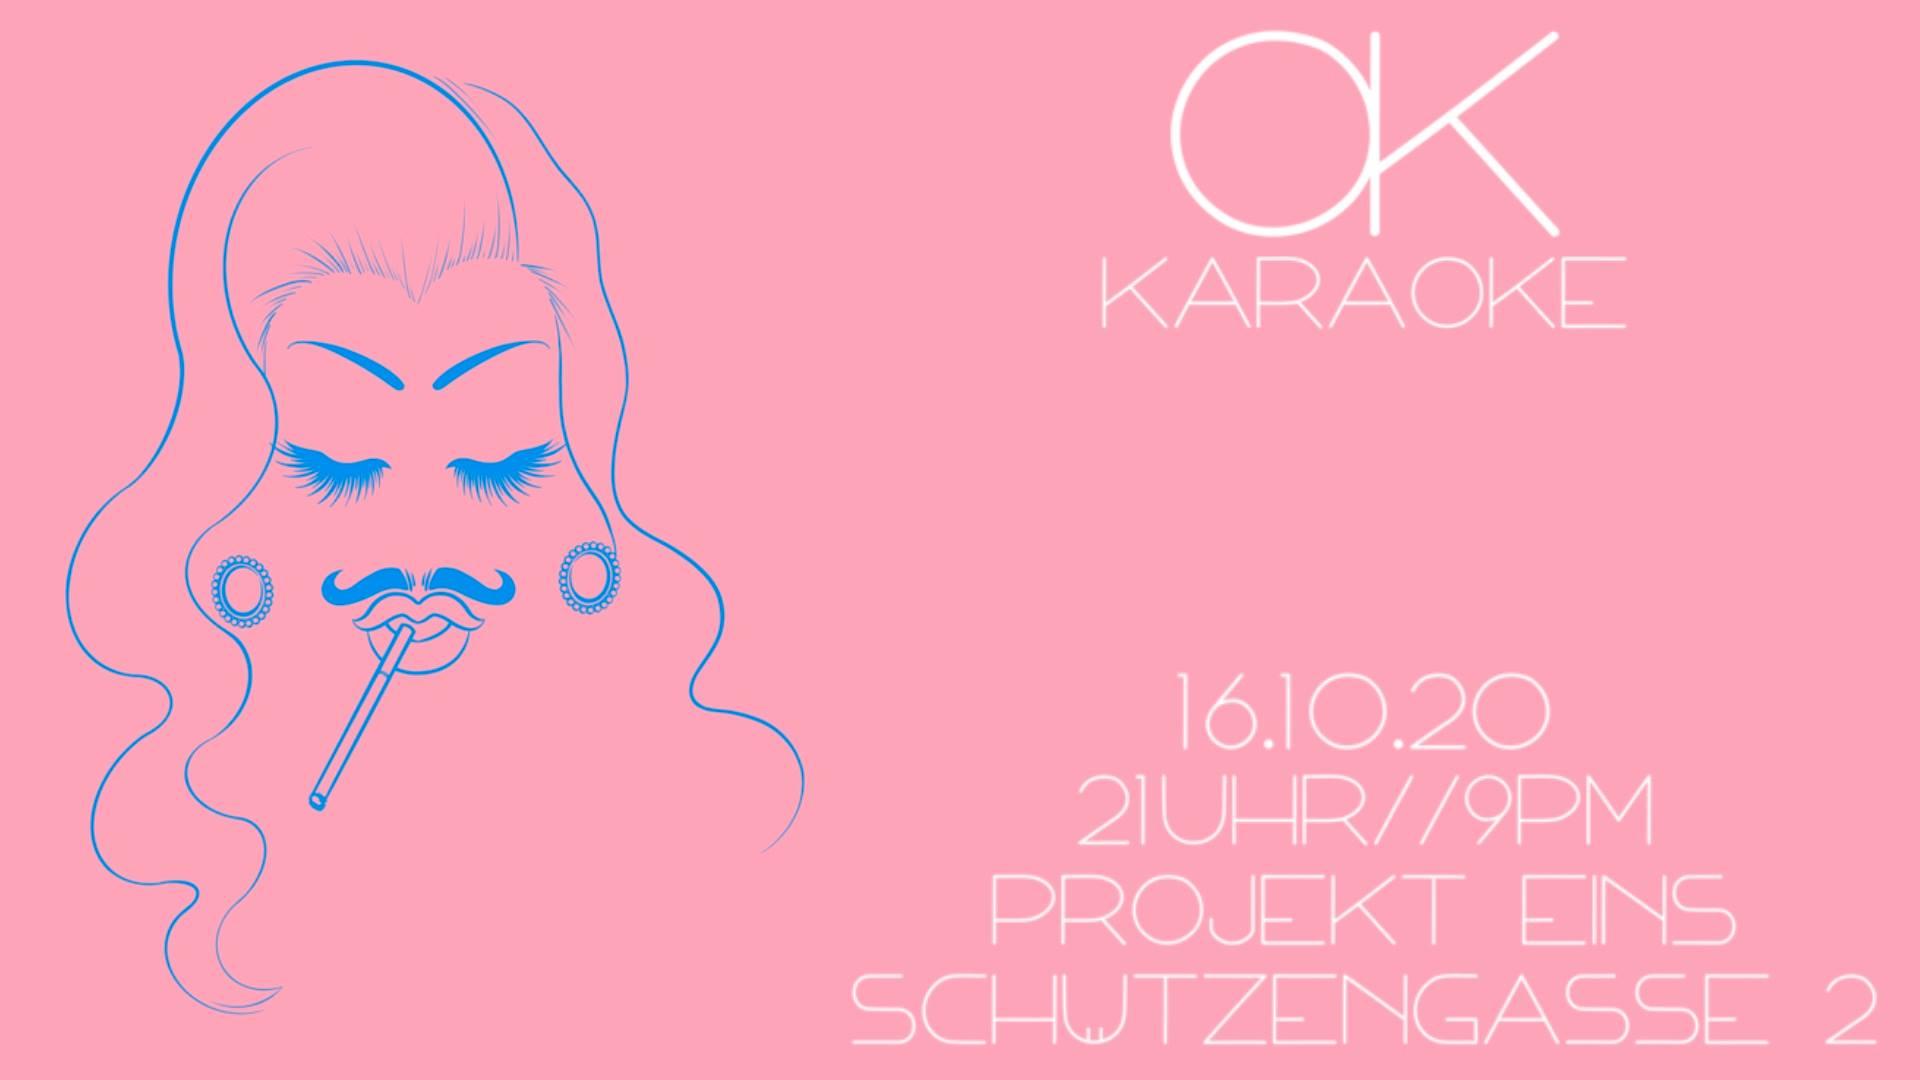 OK Karaoke - Genderf*ck